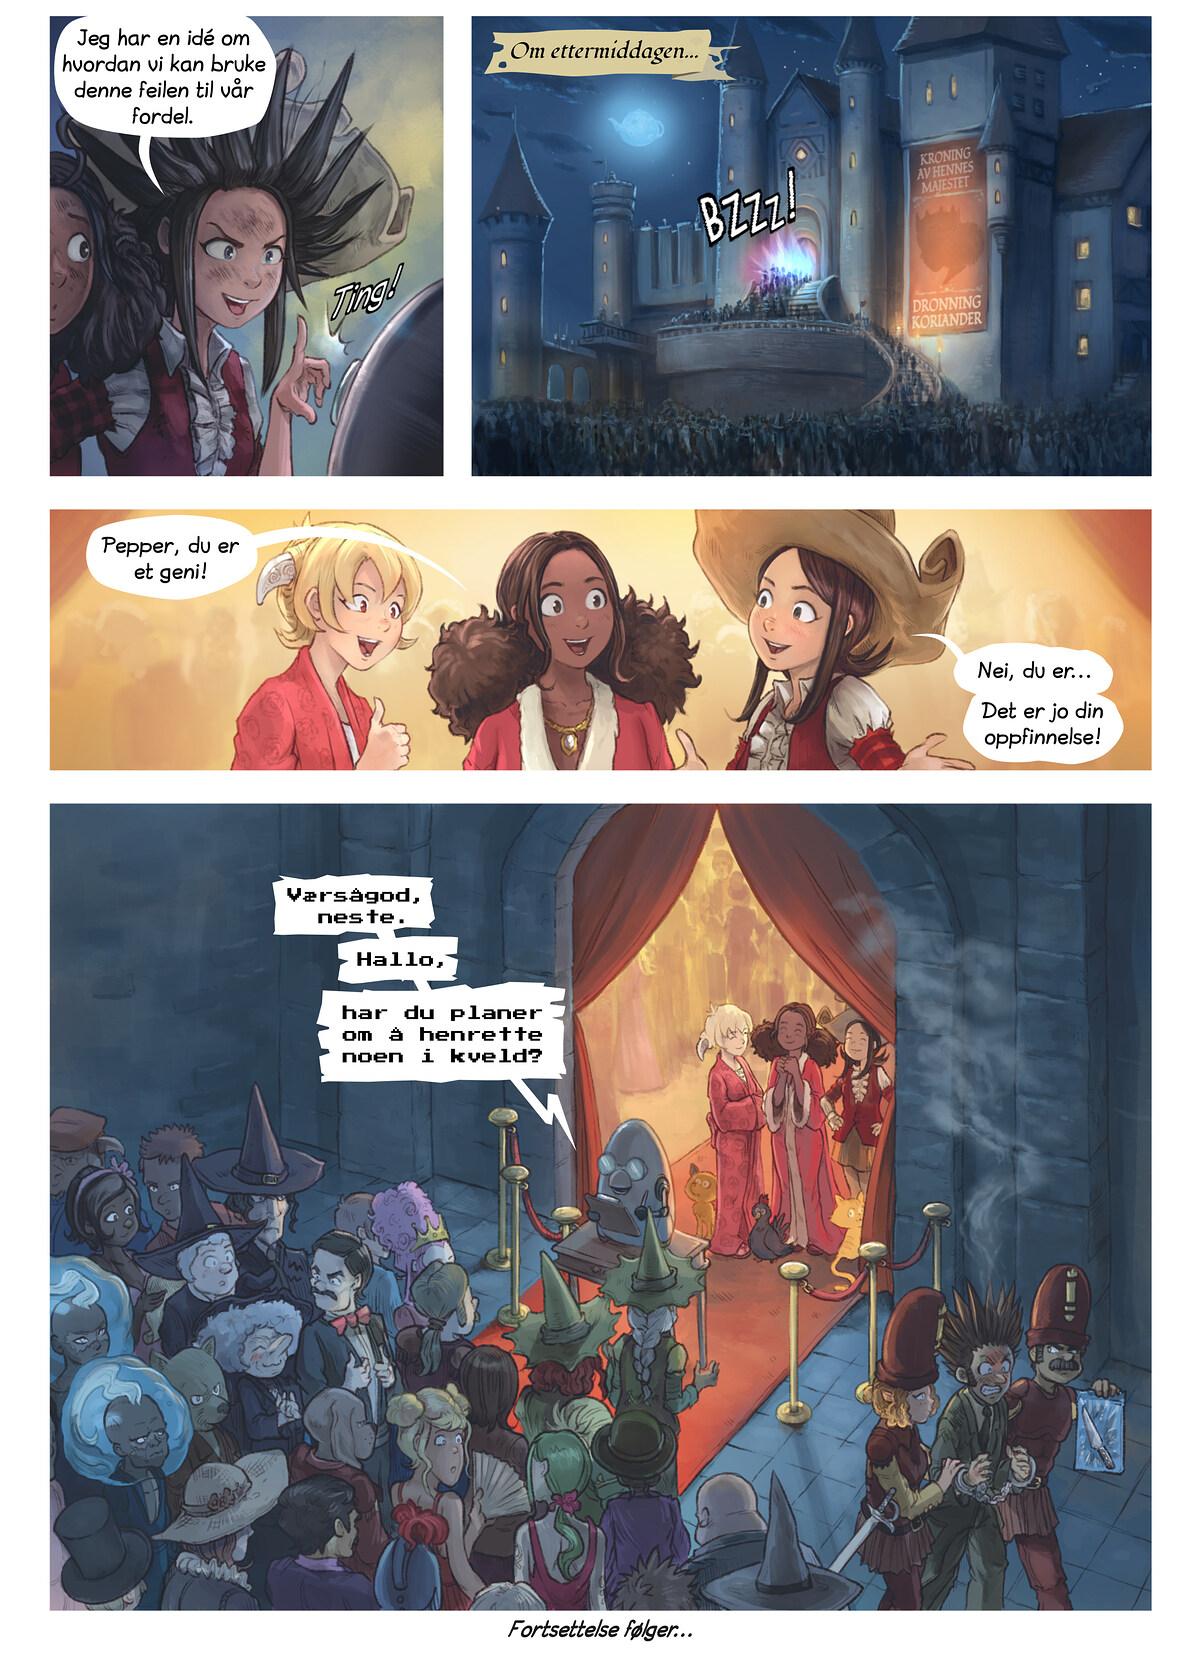 Episode 27: Korianders oppfinnelse, Page 6